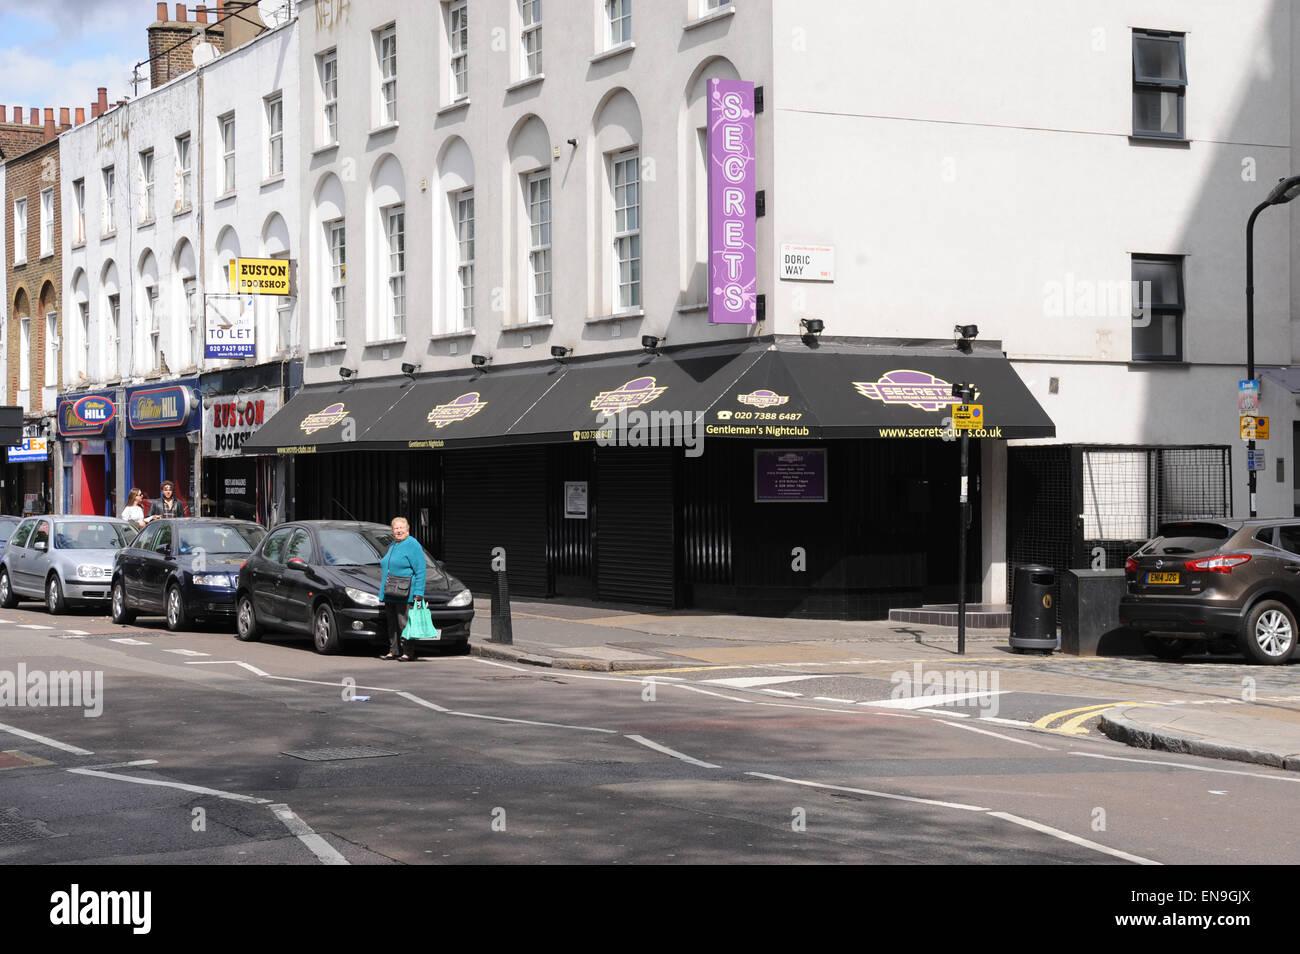 Secrets Gentleman's Nightclub Euston is the largest lap dancing club in the Secrets group. - Stock Image